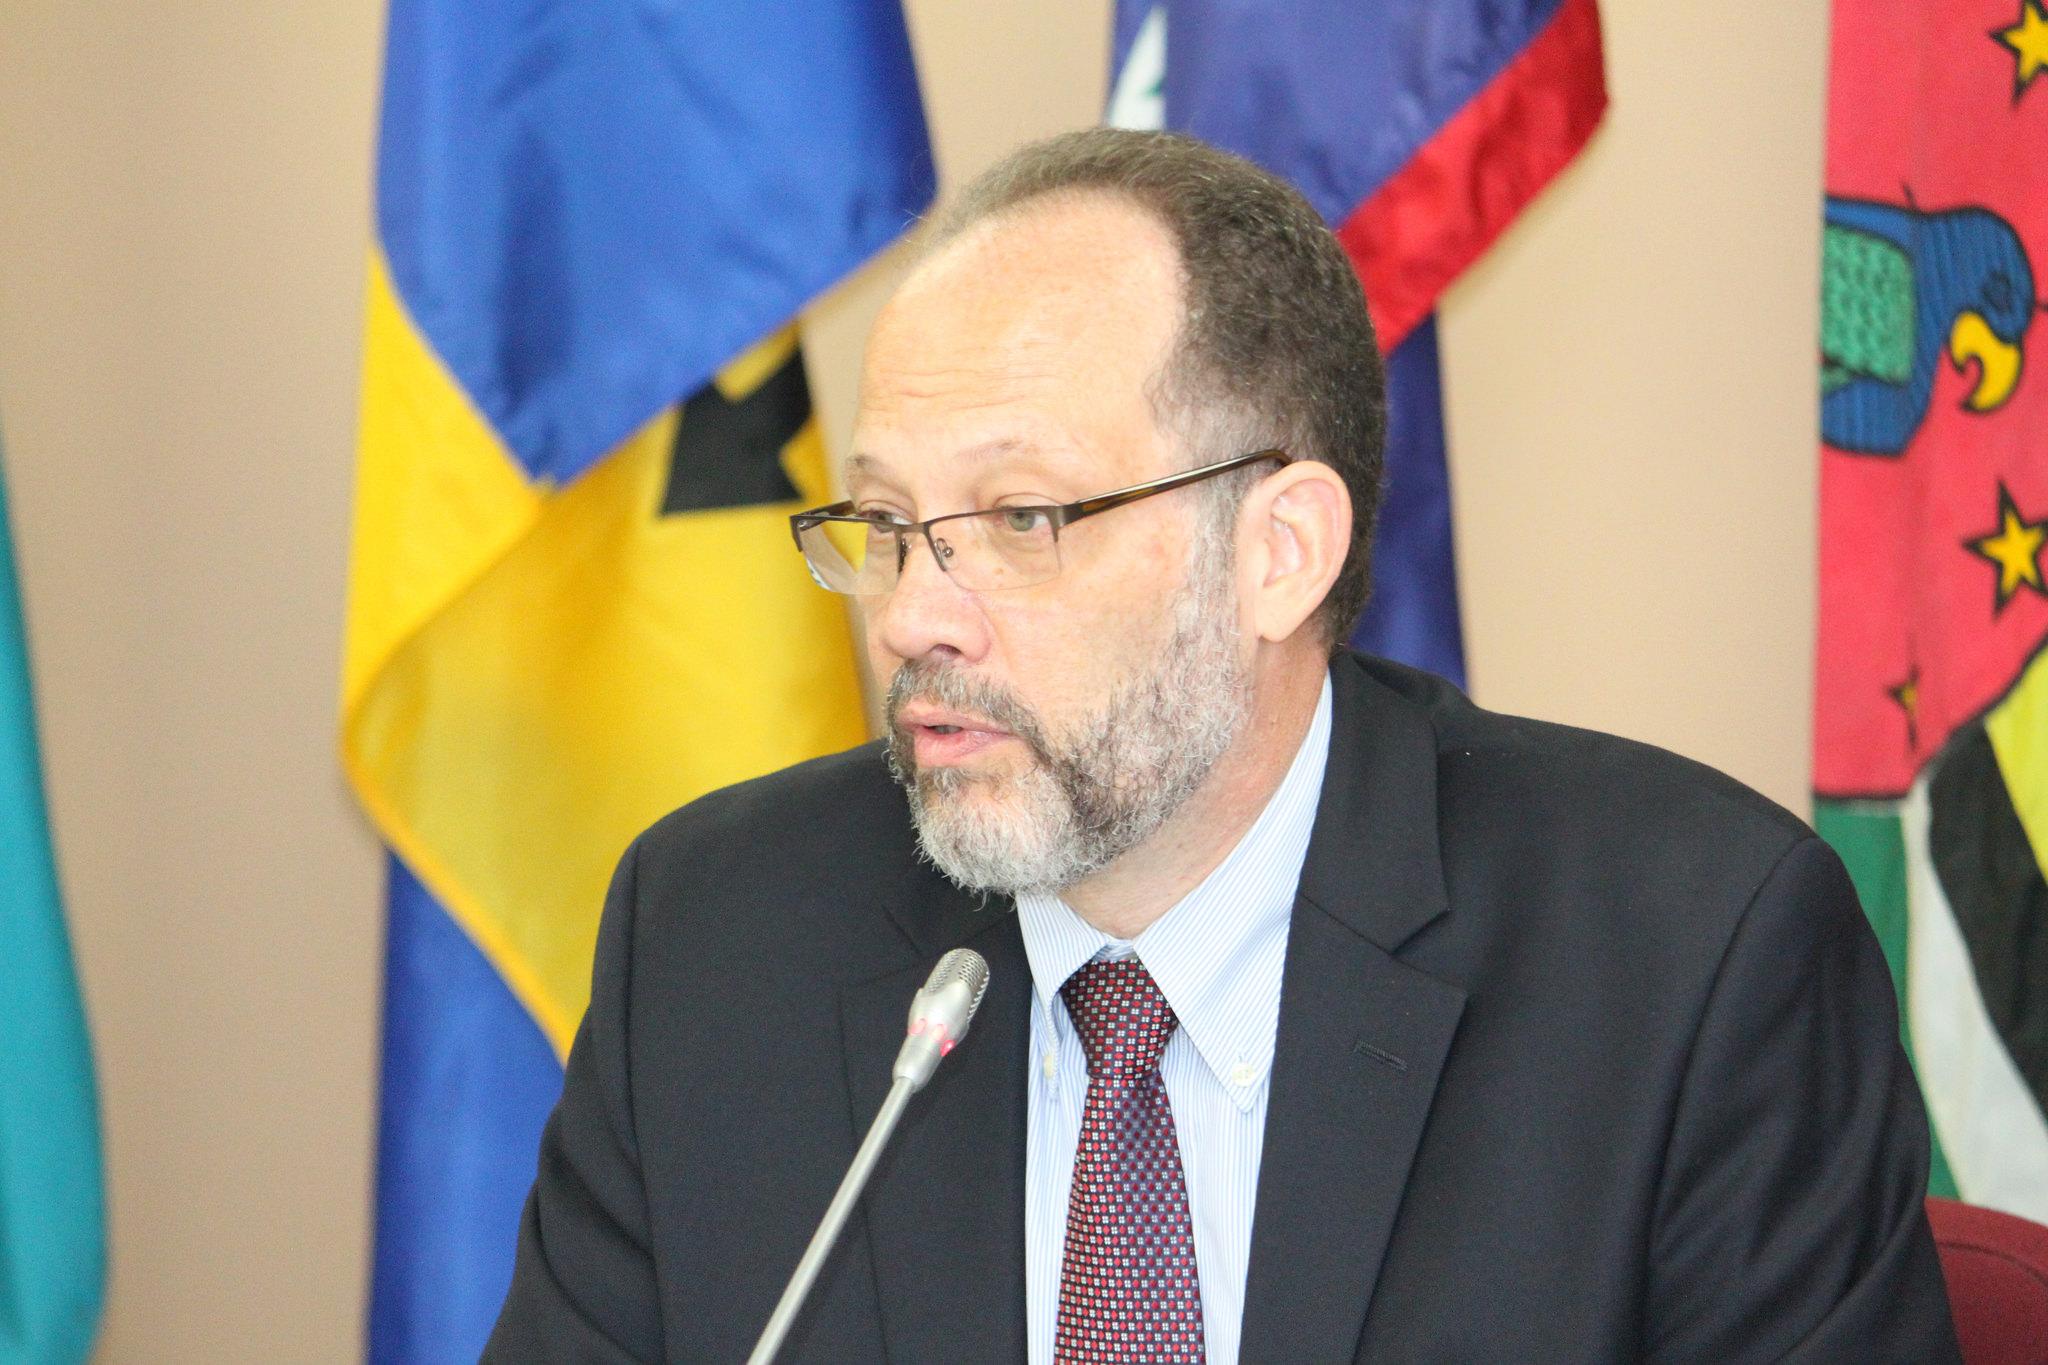 CARICOM Secretary-General Ambassador Irwin LaRocque